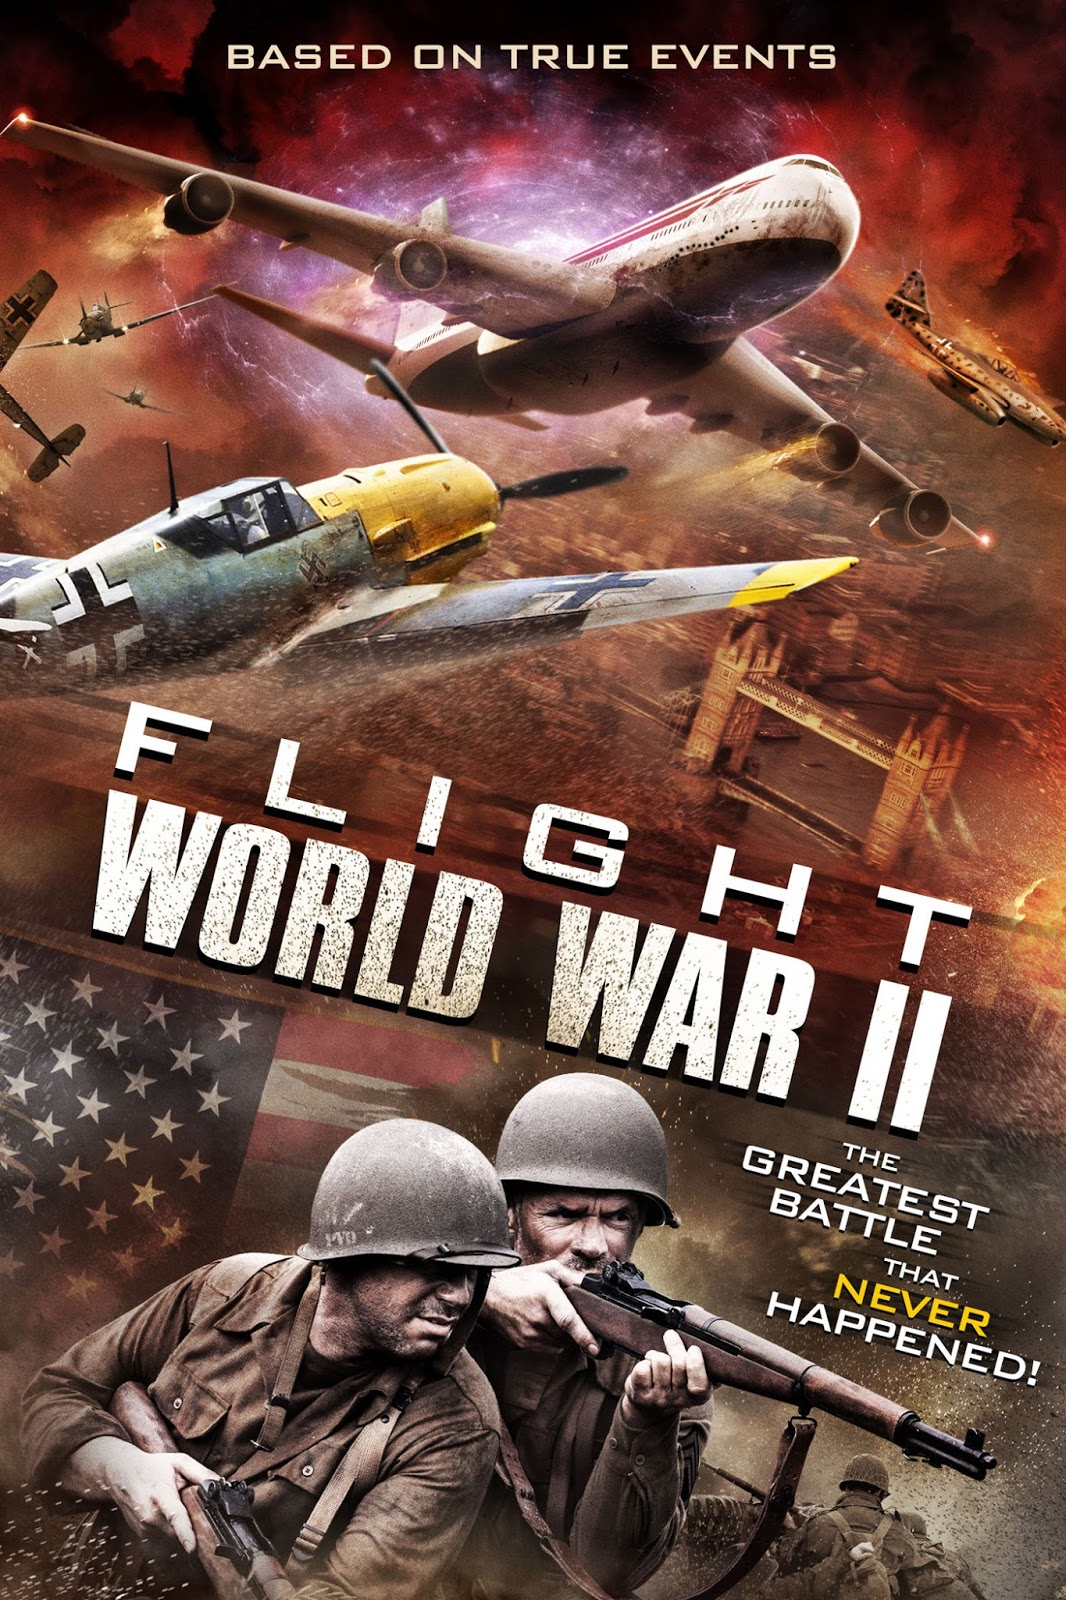 Flight World War II เที่ยวบินวฝูงสงคราม [HD][พากย์ไทย]